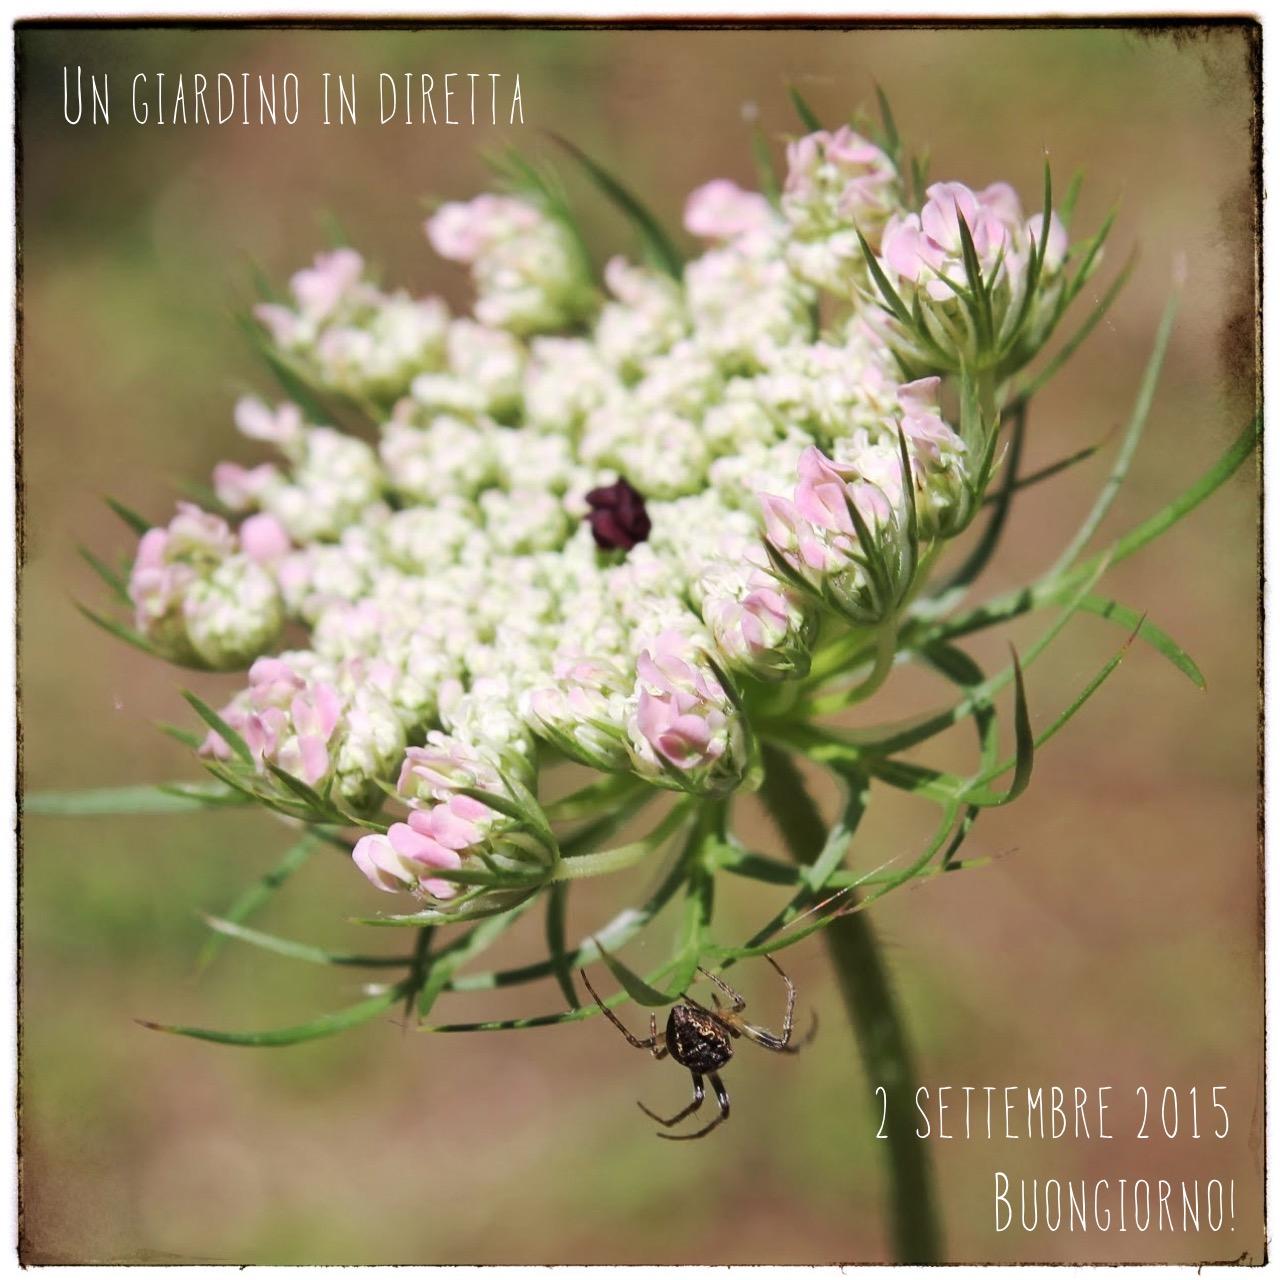 Fiori Selvatici Foto E Nomi fiori di settembre: carota selvatica (daucus carota l.) - un